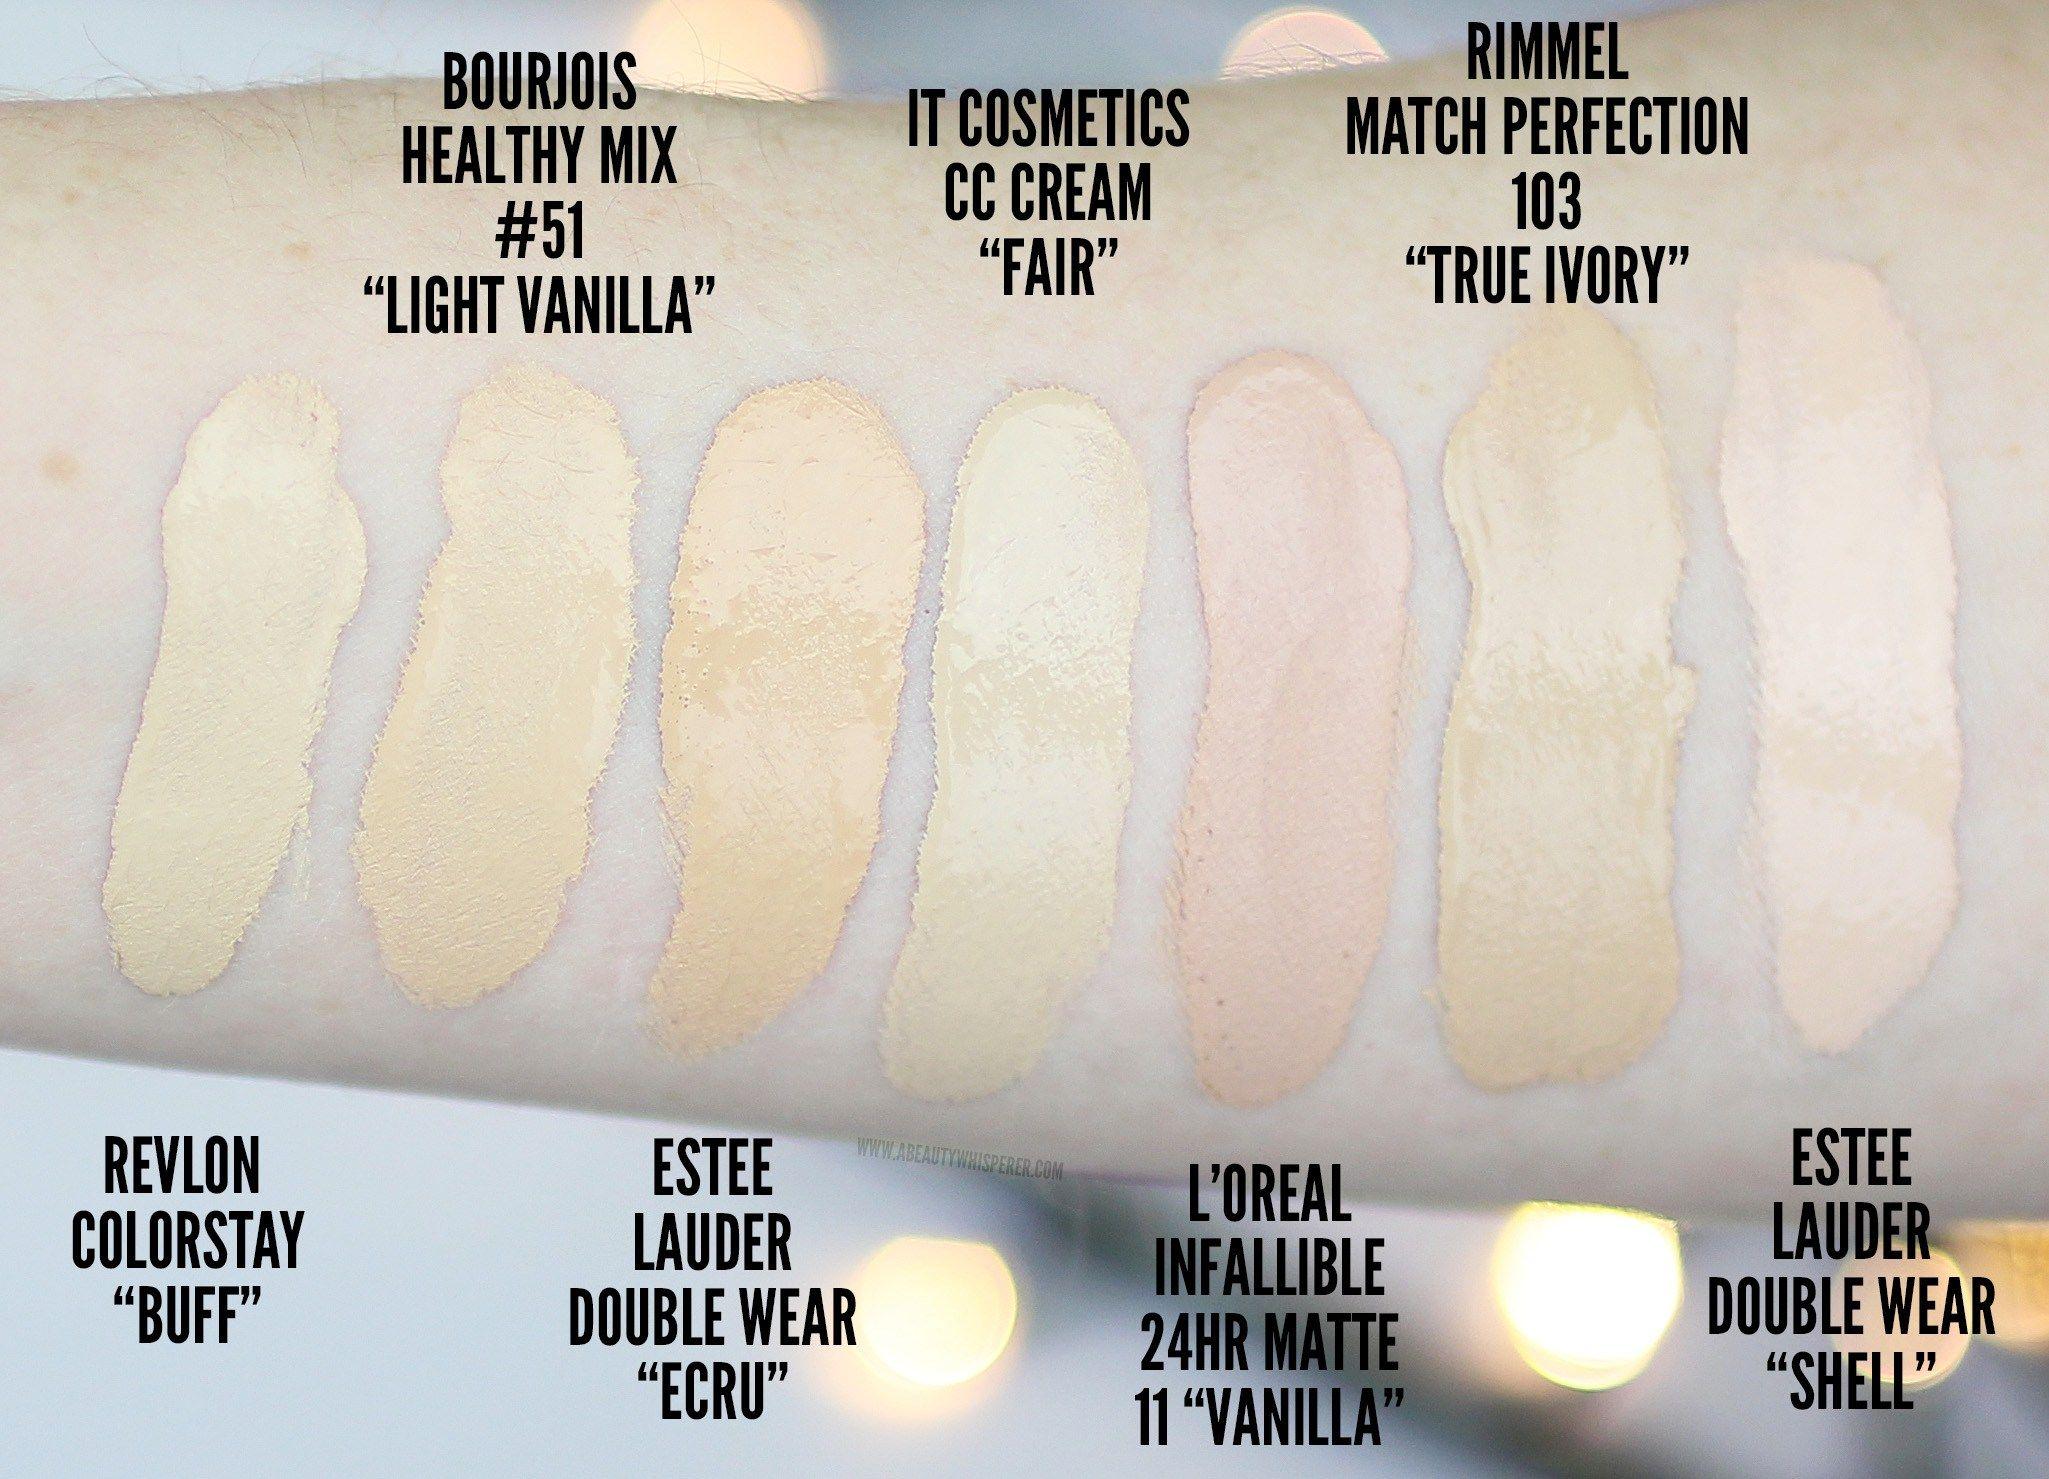 Bluehost Com It Cosmetics Cc Cream Swatches It Cosmetics Cc Cream Cc Cream Review